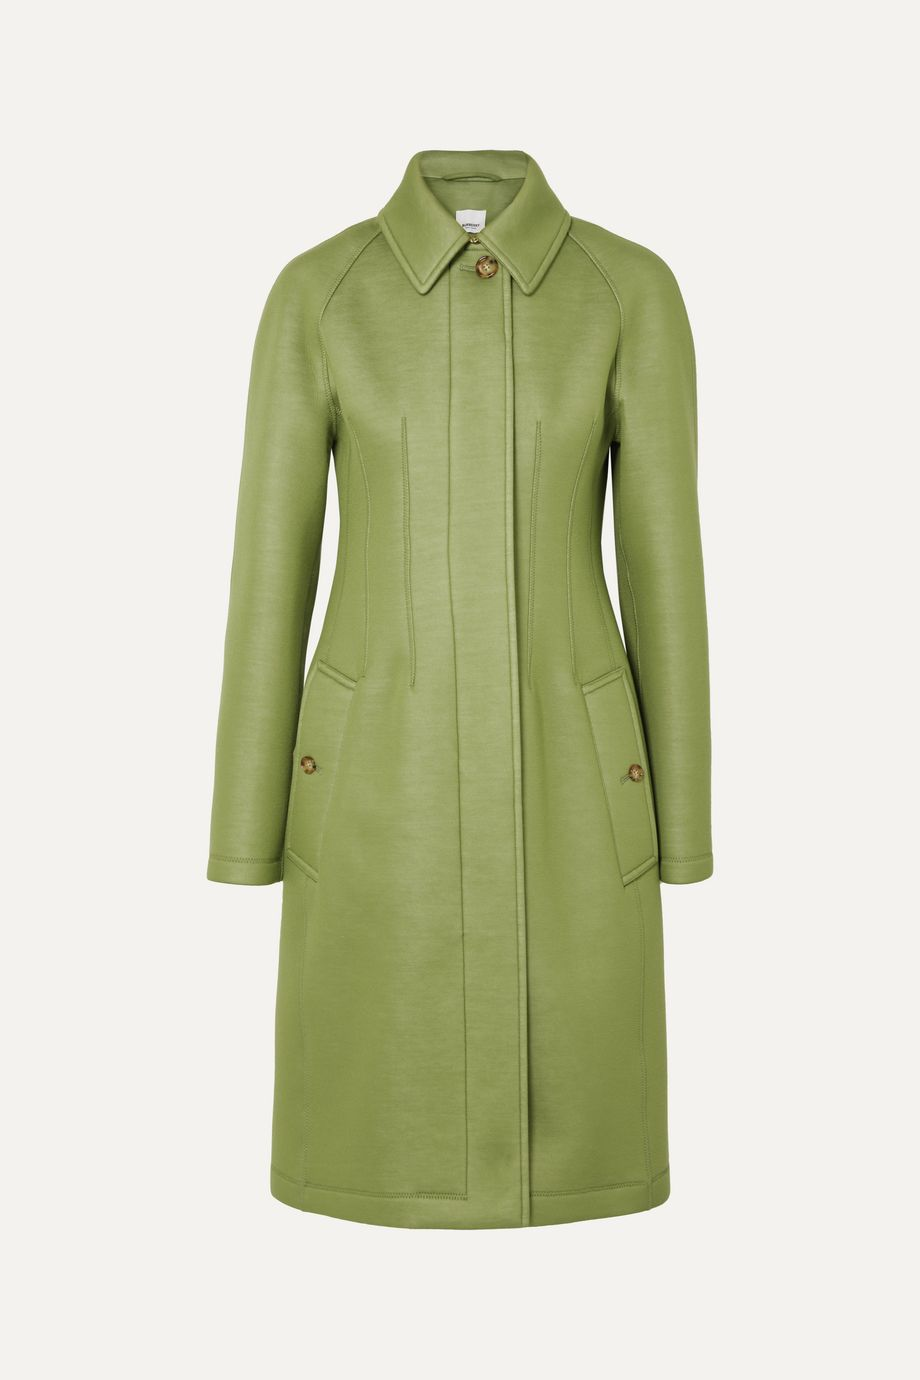 Burberry Neoprene coat